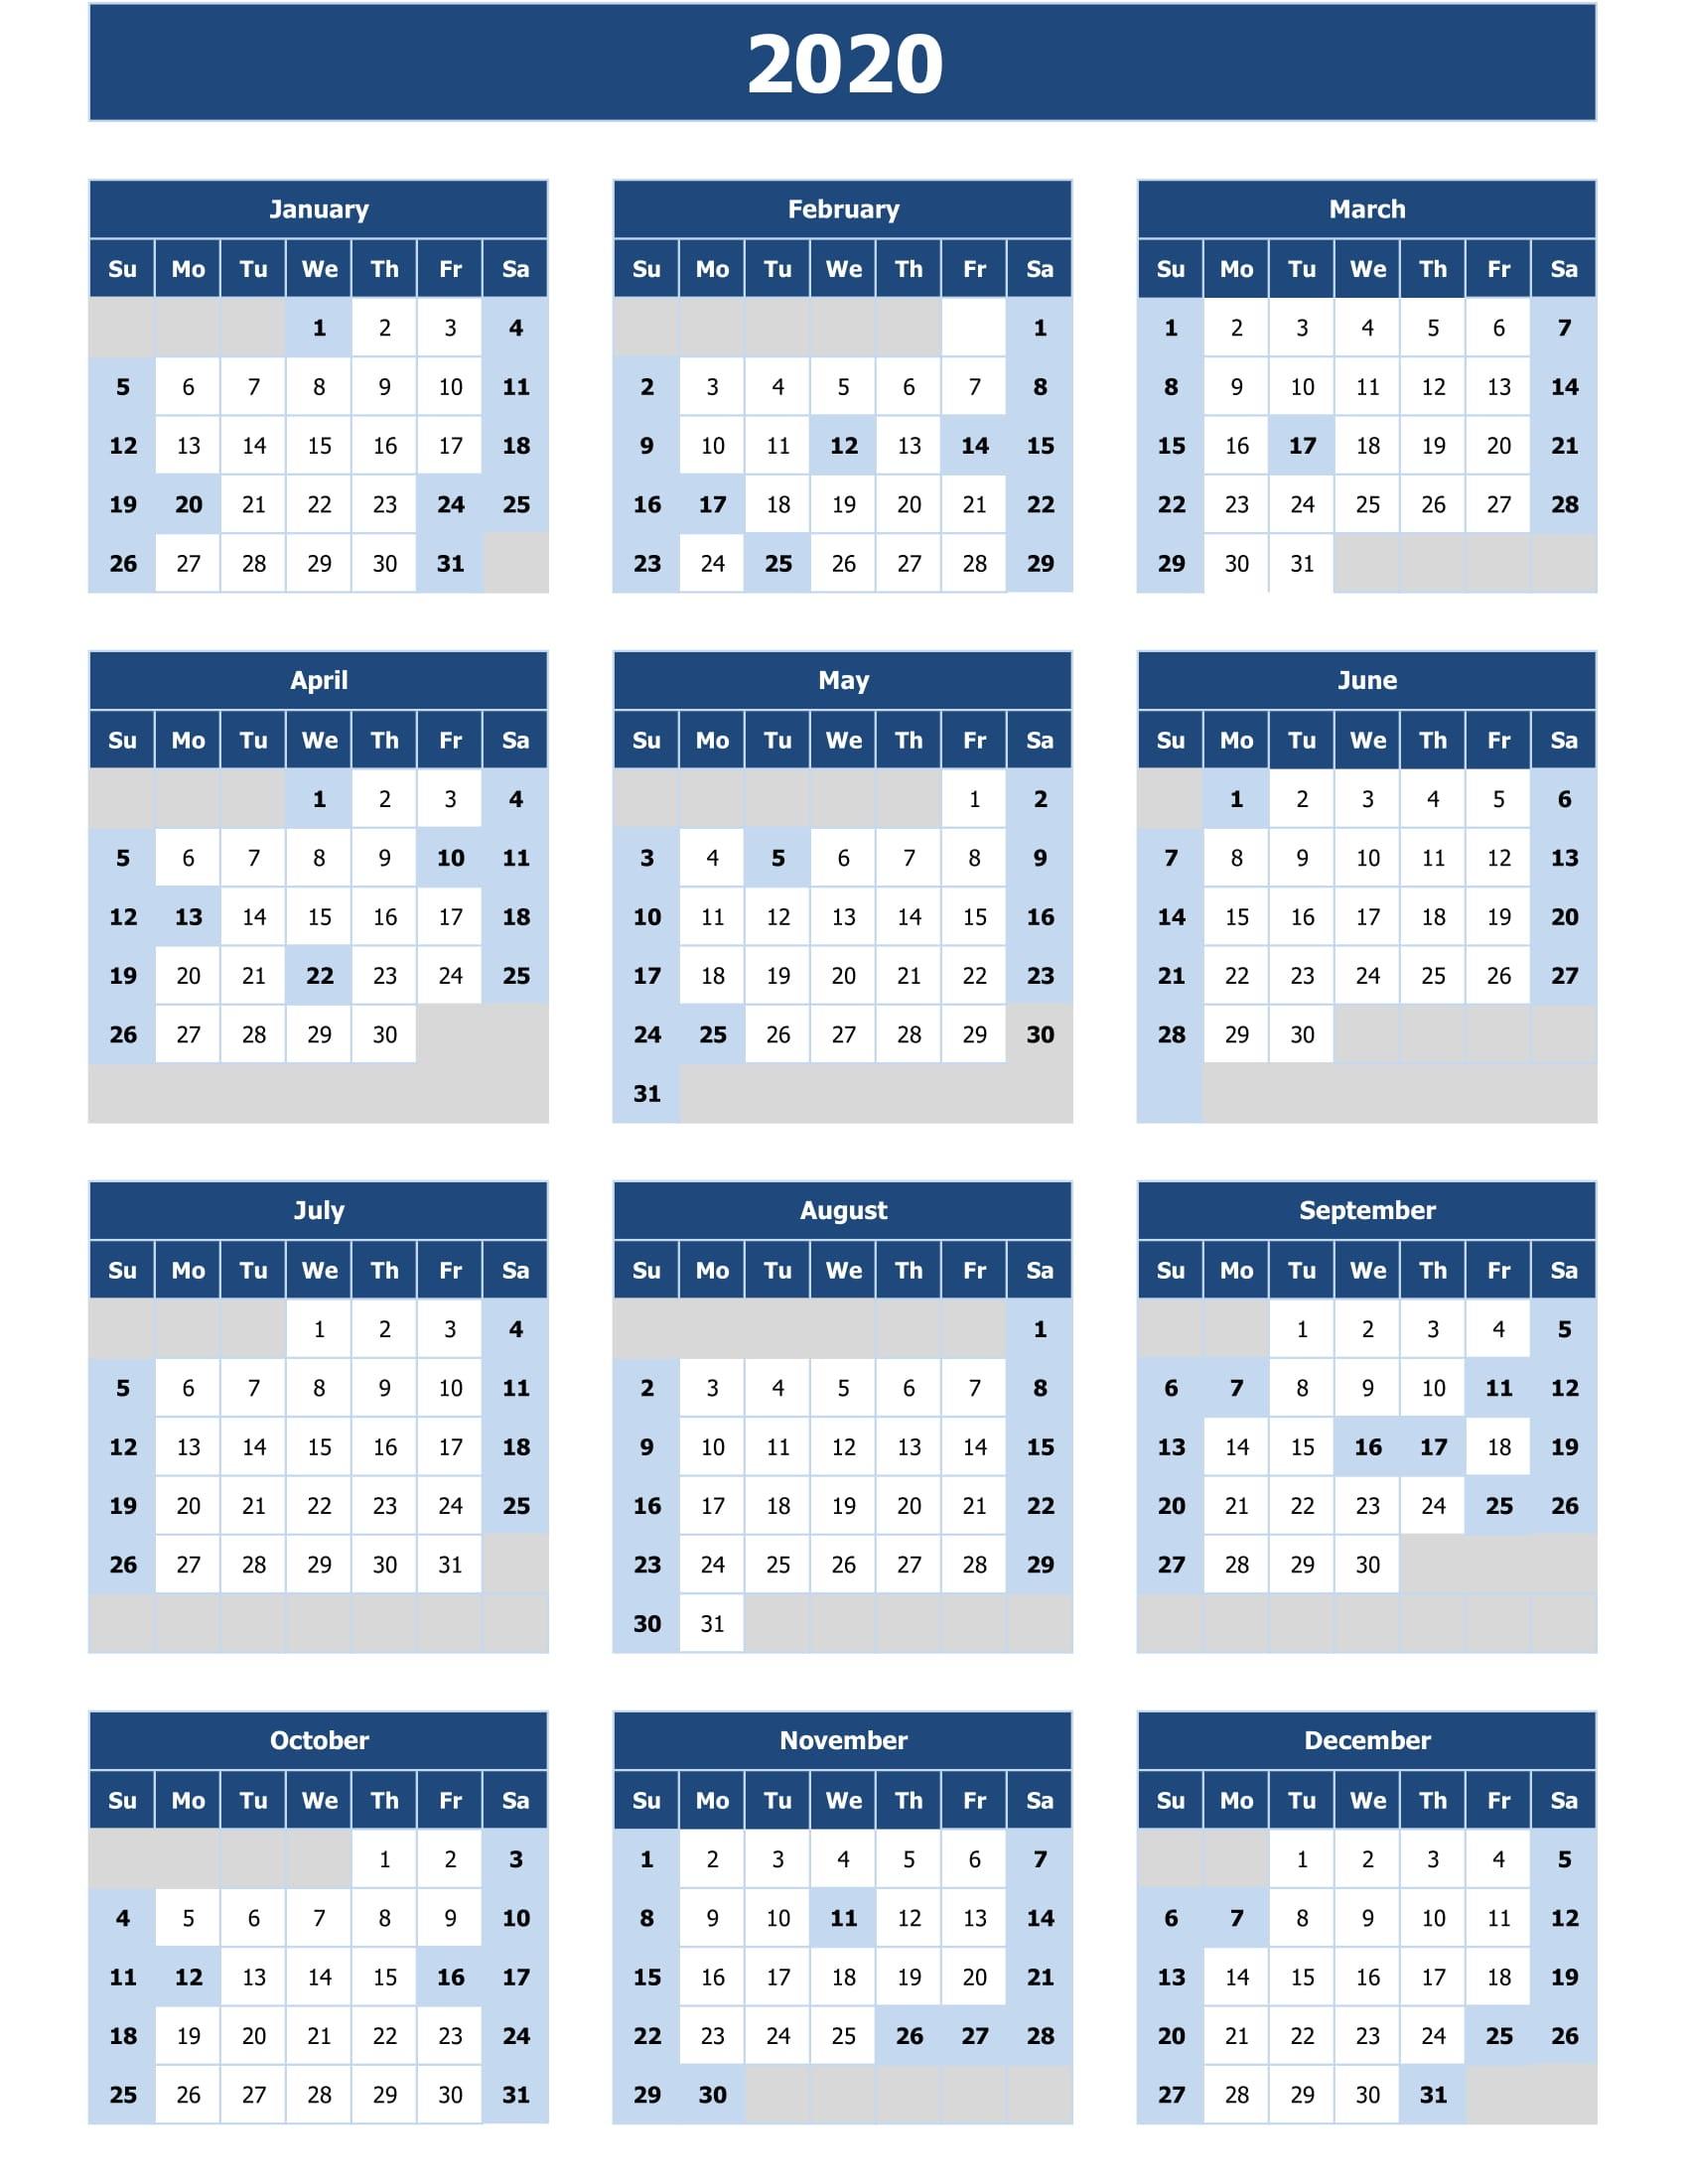 2020 Calendar Excel For Your Good Day For Desk | Calendar regarding Calendarpedia 2020 Excel